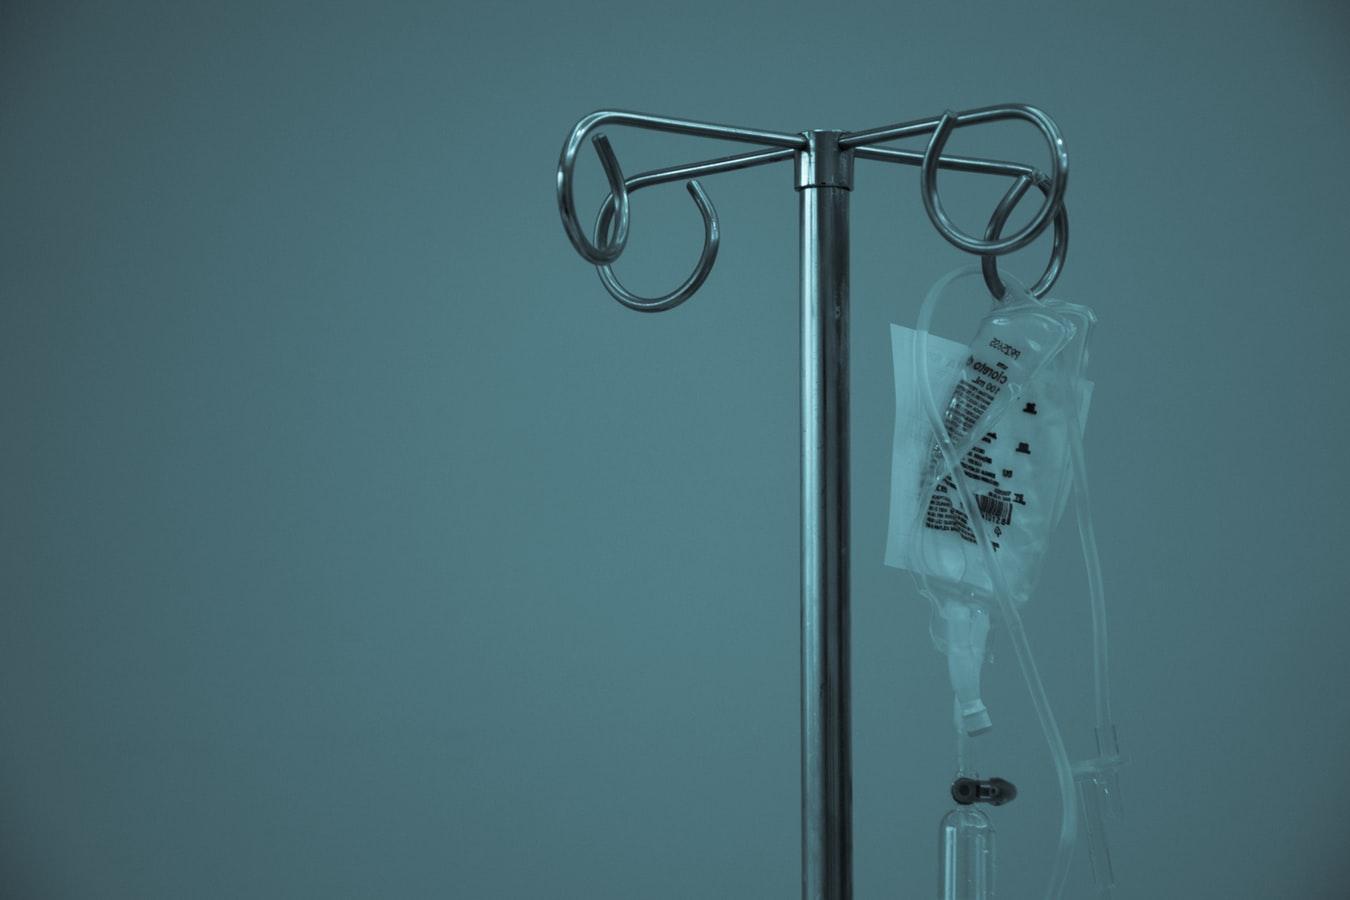 infezioni ospedale codacons